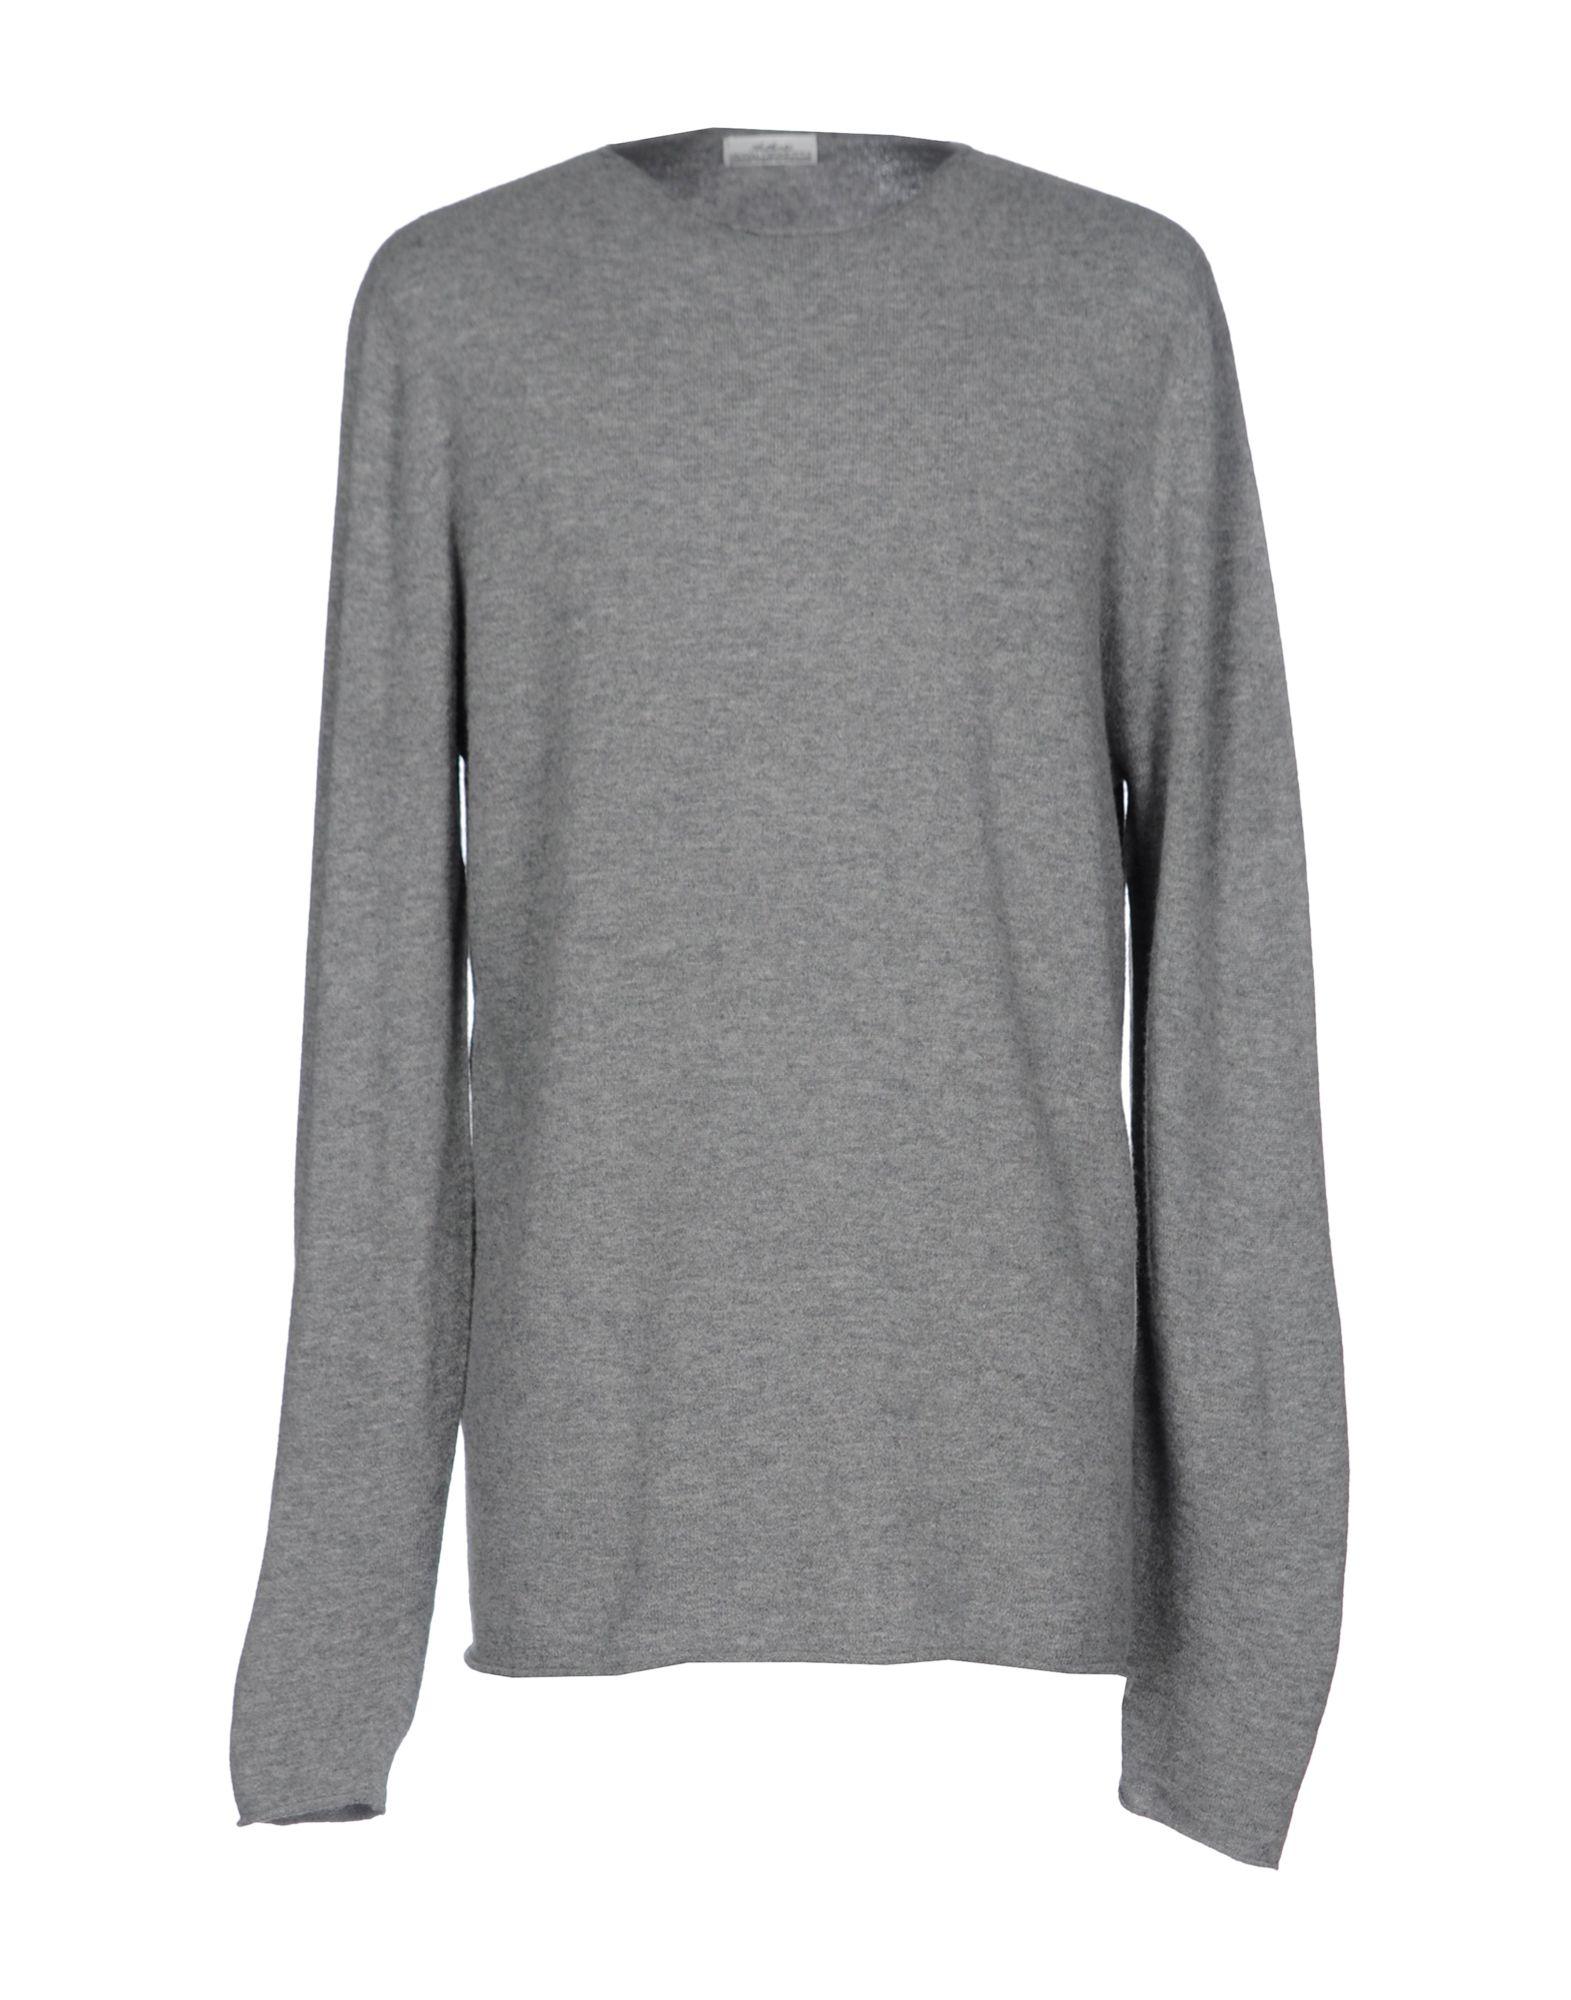 Pullover Authentic Original Vintage Style Uomo - Acquista online su